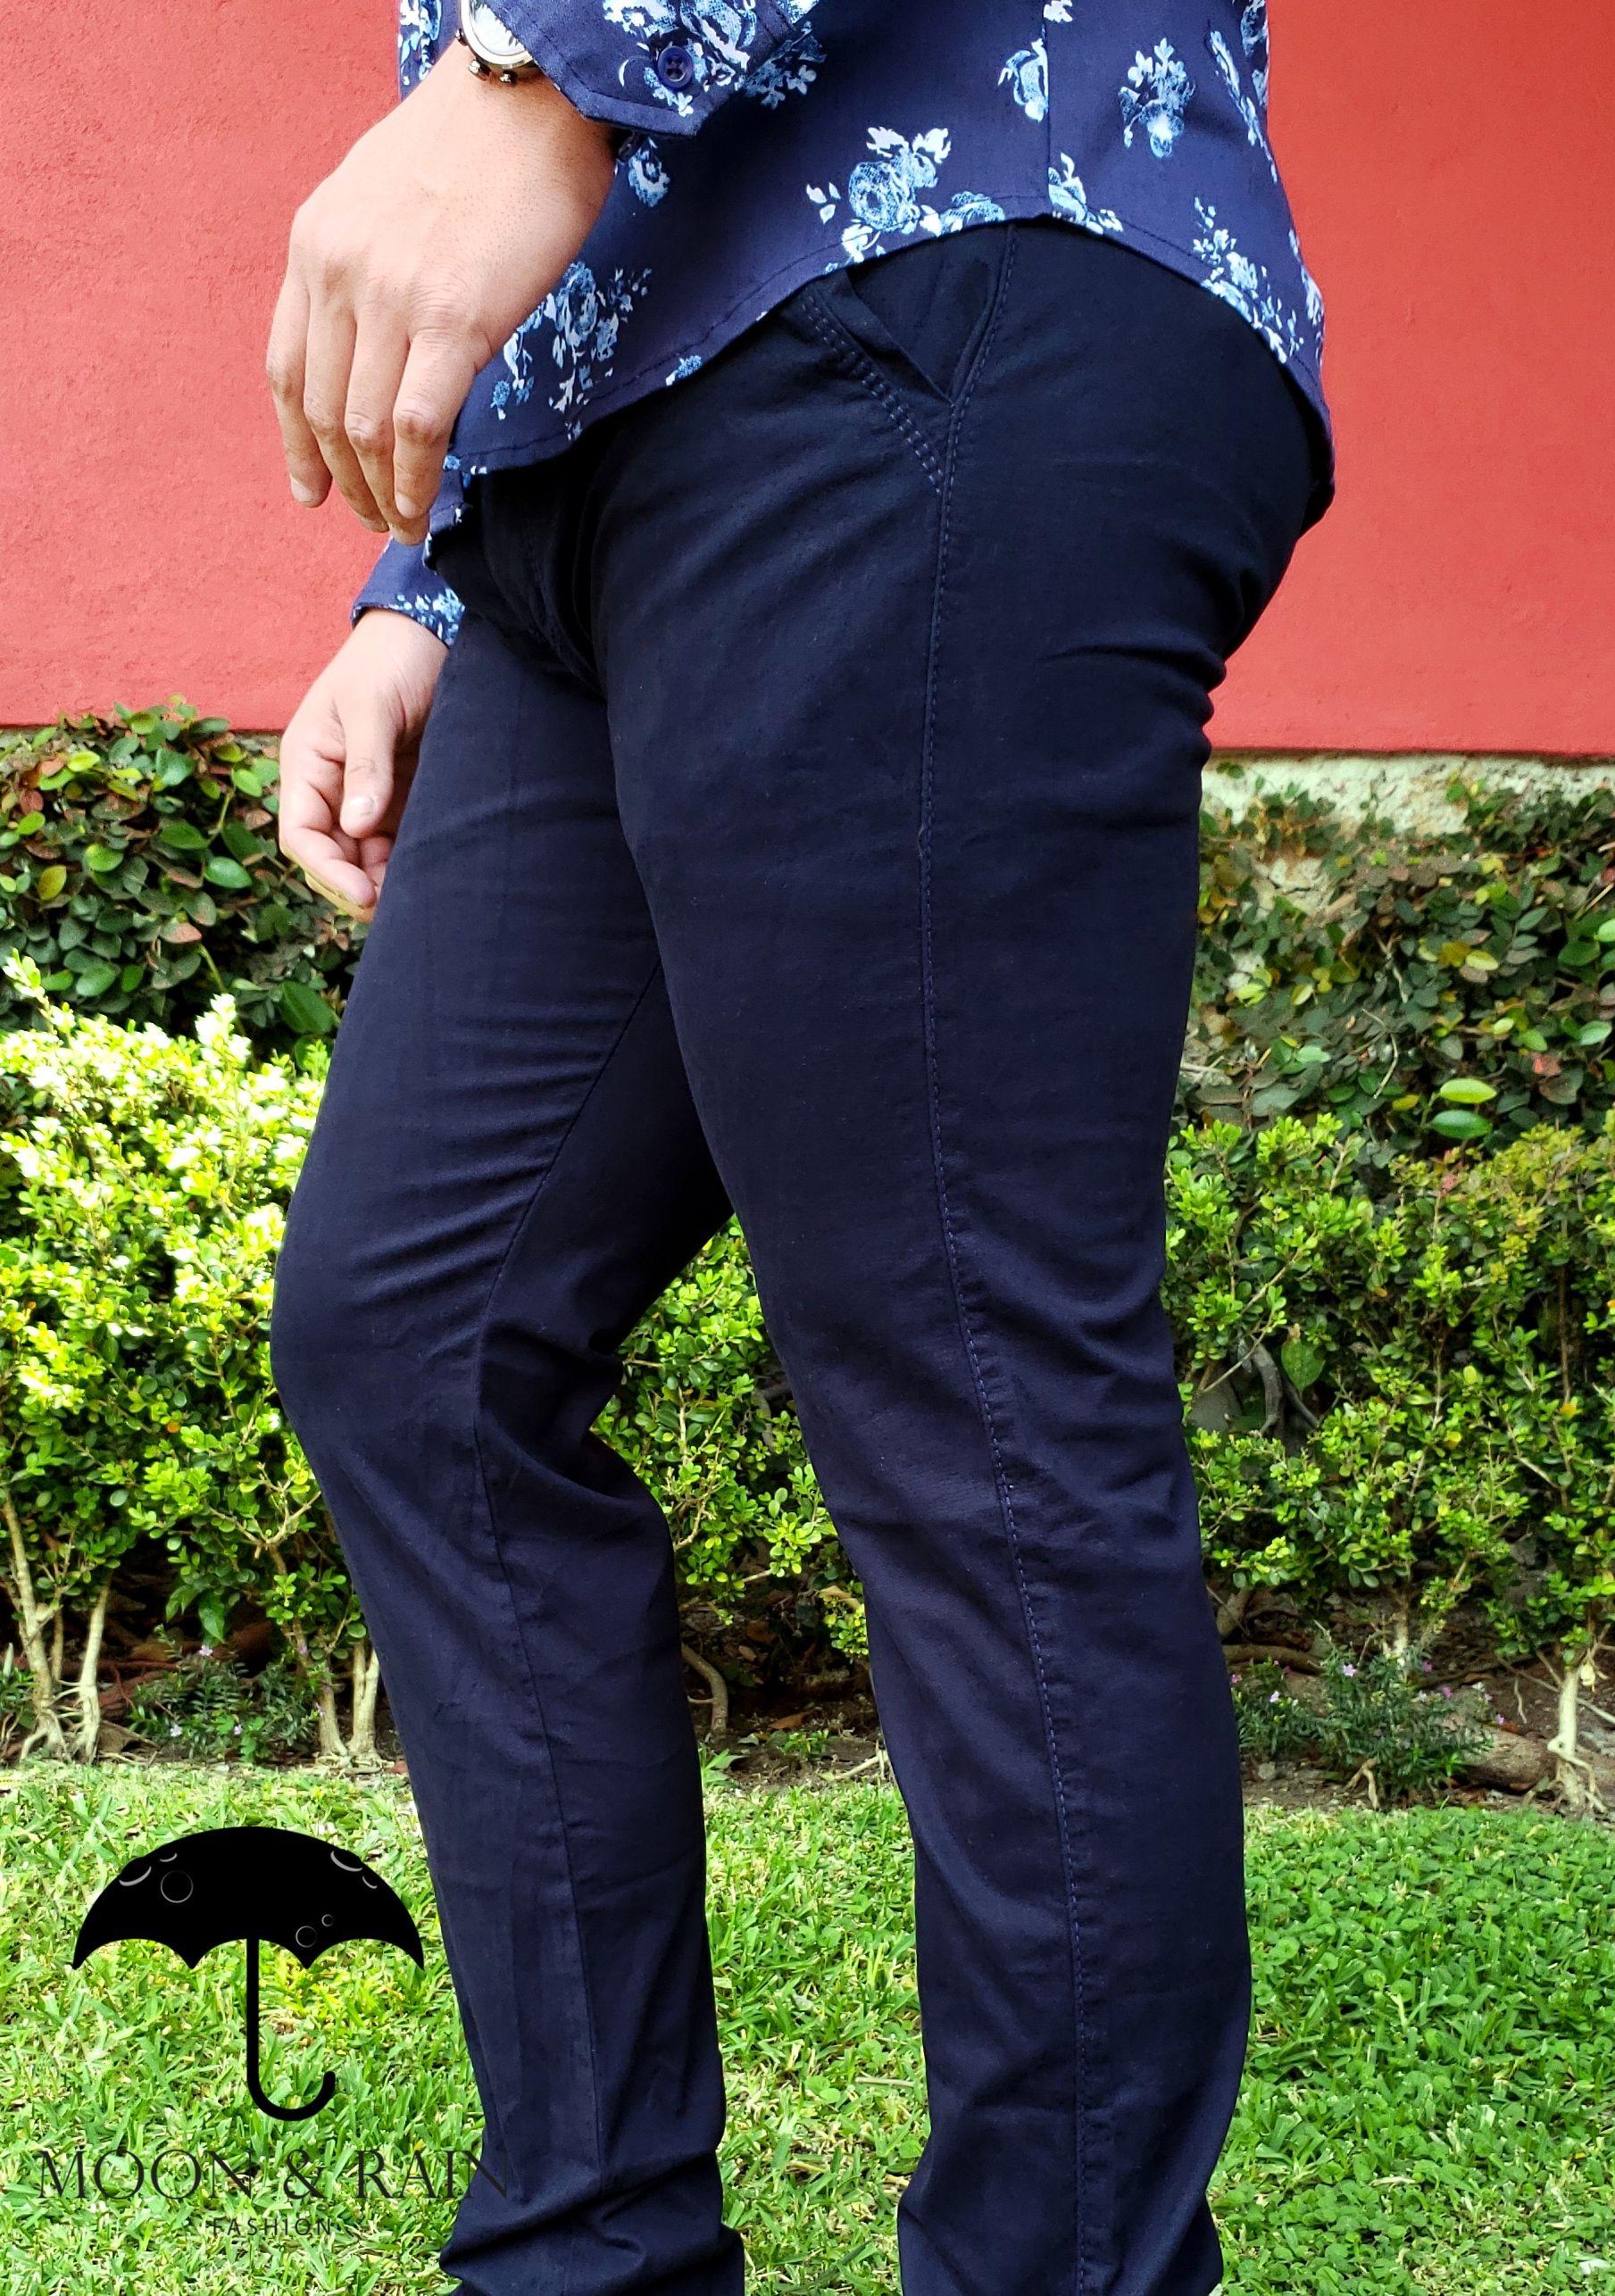 Outfit Para Hombre Pantalon Skinny De Gabardina Azul Marino Tenis Blancos Disenos De La Marca Ropa Casual Hombre Maduro Ropa Casual Hombres Ropa De Hombre